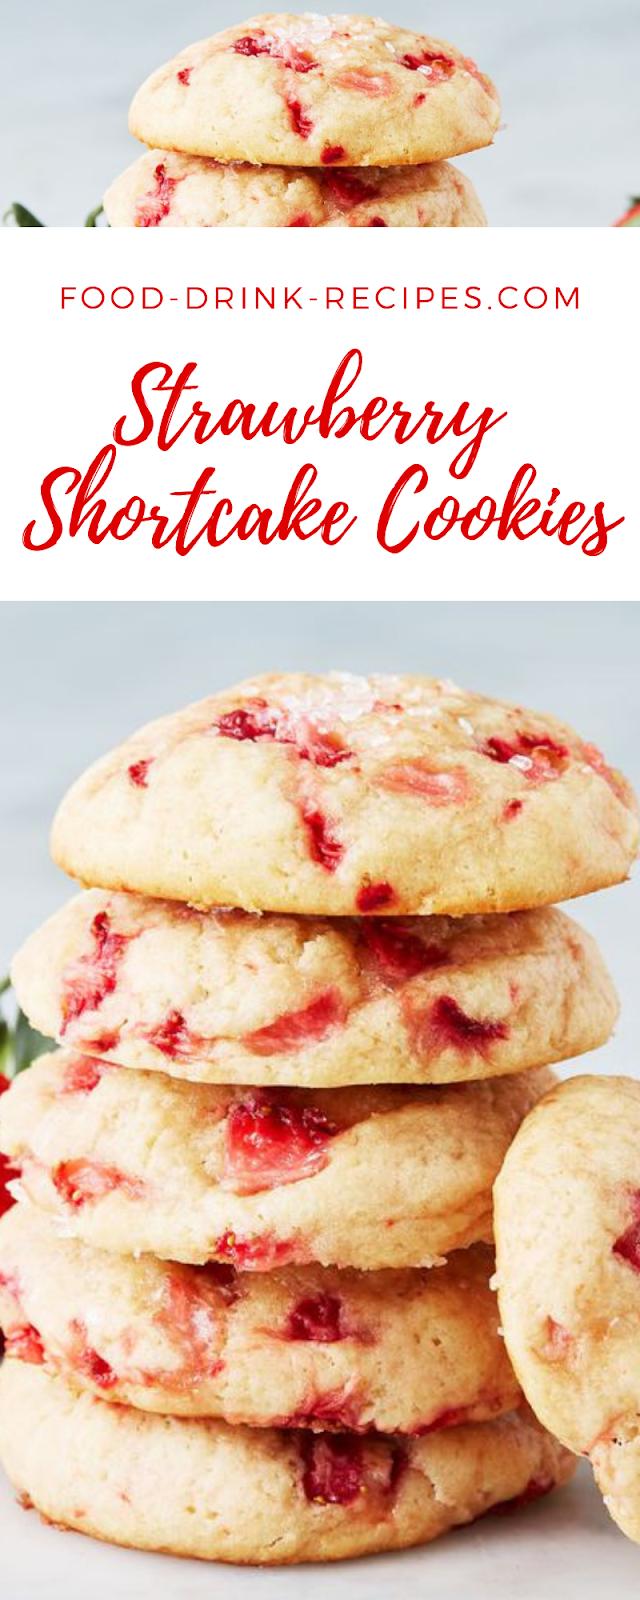 Strawberry Shortcake Cookies - food-drink-recipes.com